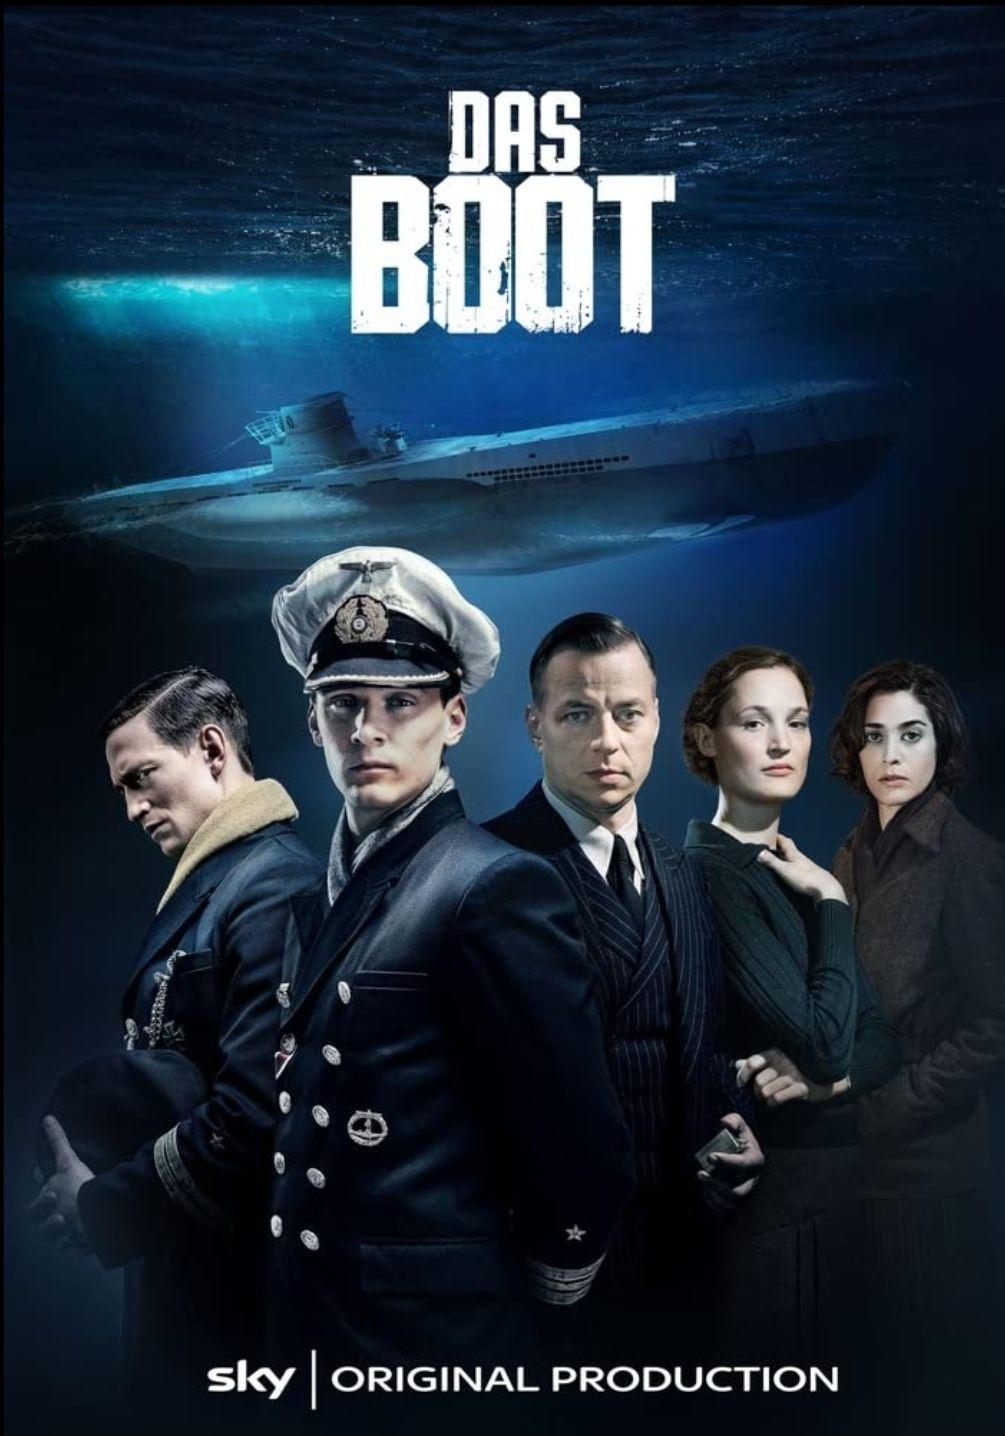 Das Boot Staffel 1 & 2 (2018, IMDb 7.4) kostenlos streamen